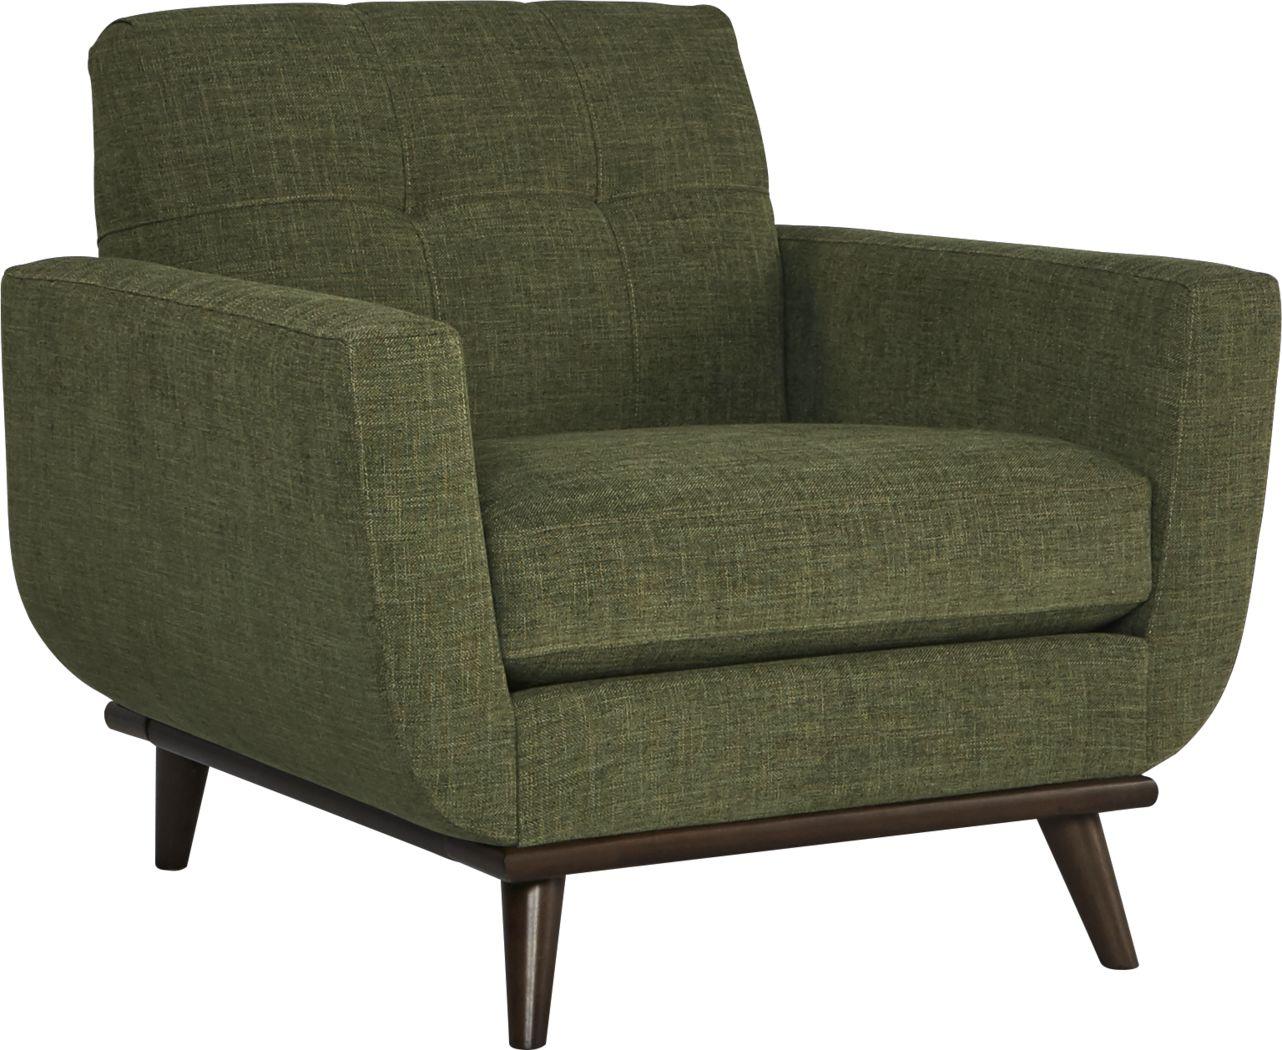 East Side Avocado Chair